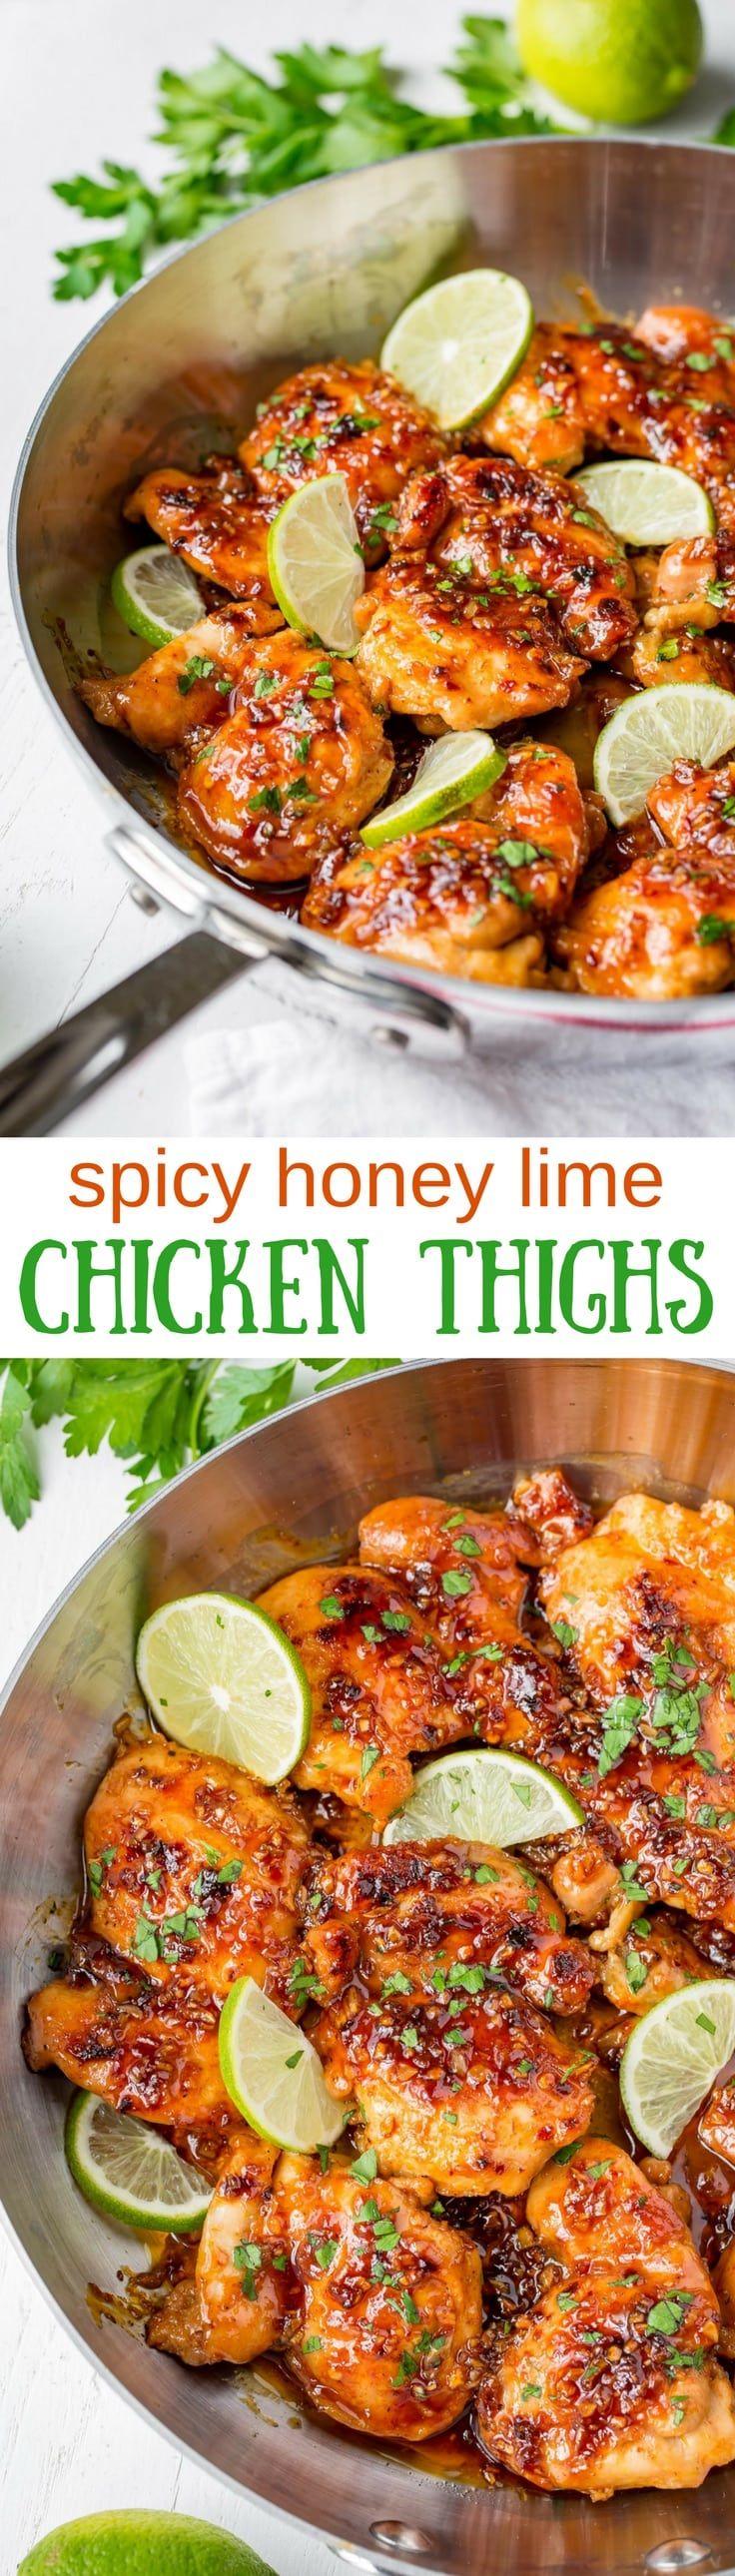 Spicy Honey Lime Chicken Thigh Recipe - Saving Room for Dessert